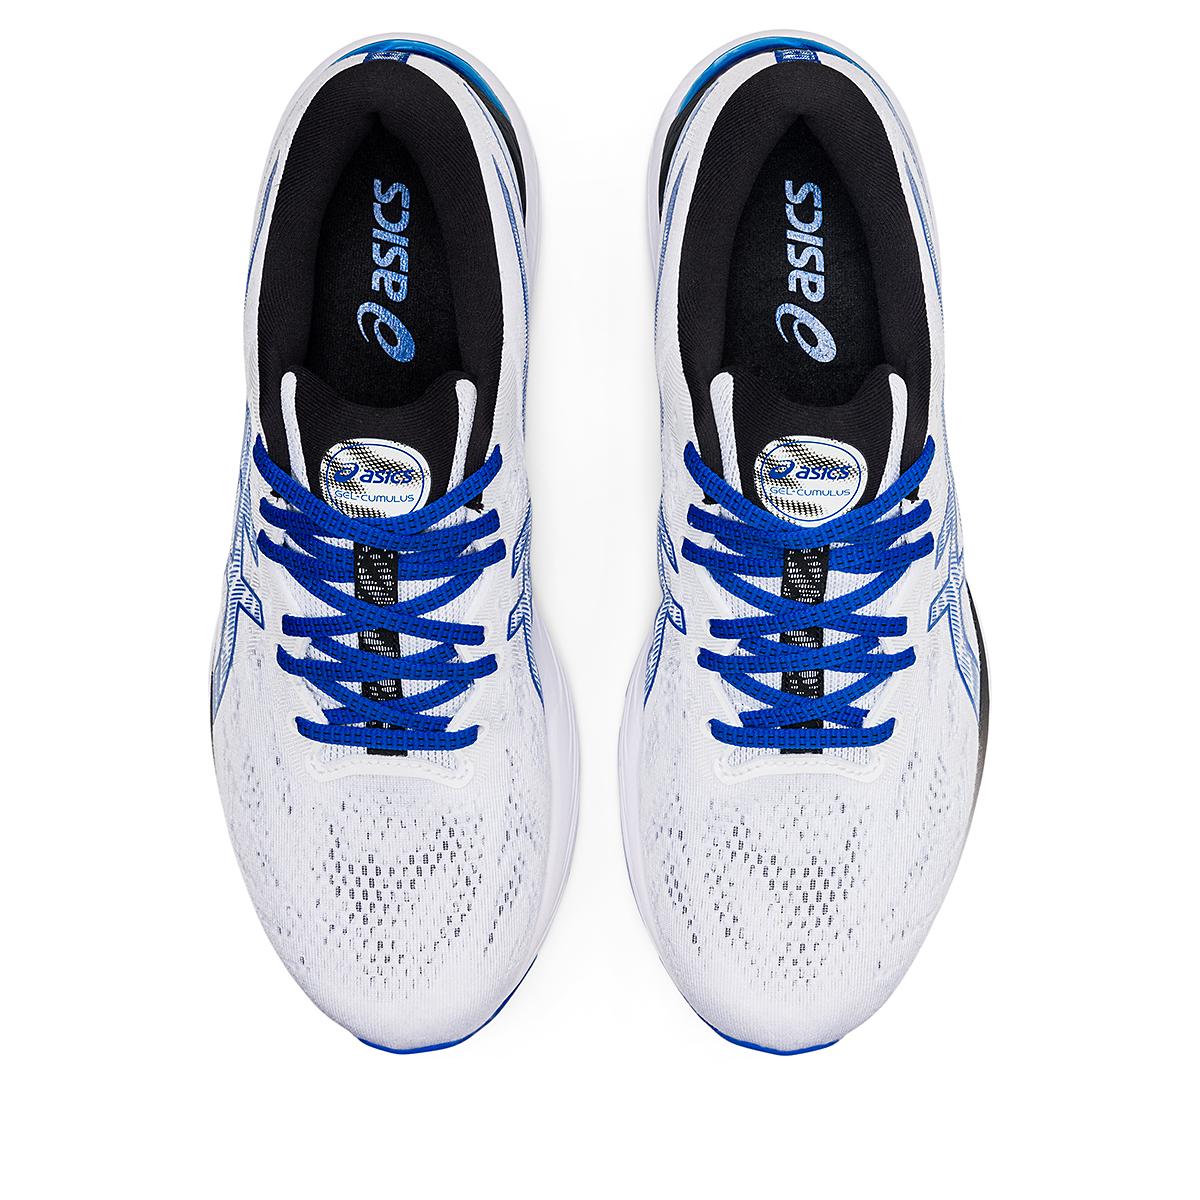 Men's Asics SMU Gel-Cumulus 23 Running Shoe - Color: White/Tuna Blue - Size: 6 - Width: Regular, White/Tuna Blue, large, image 6